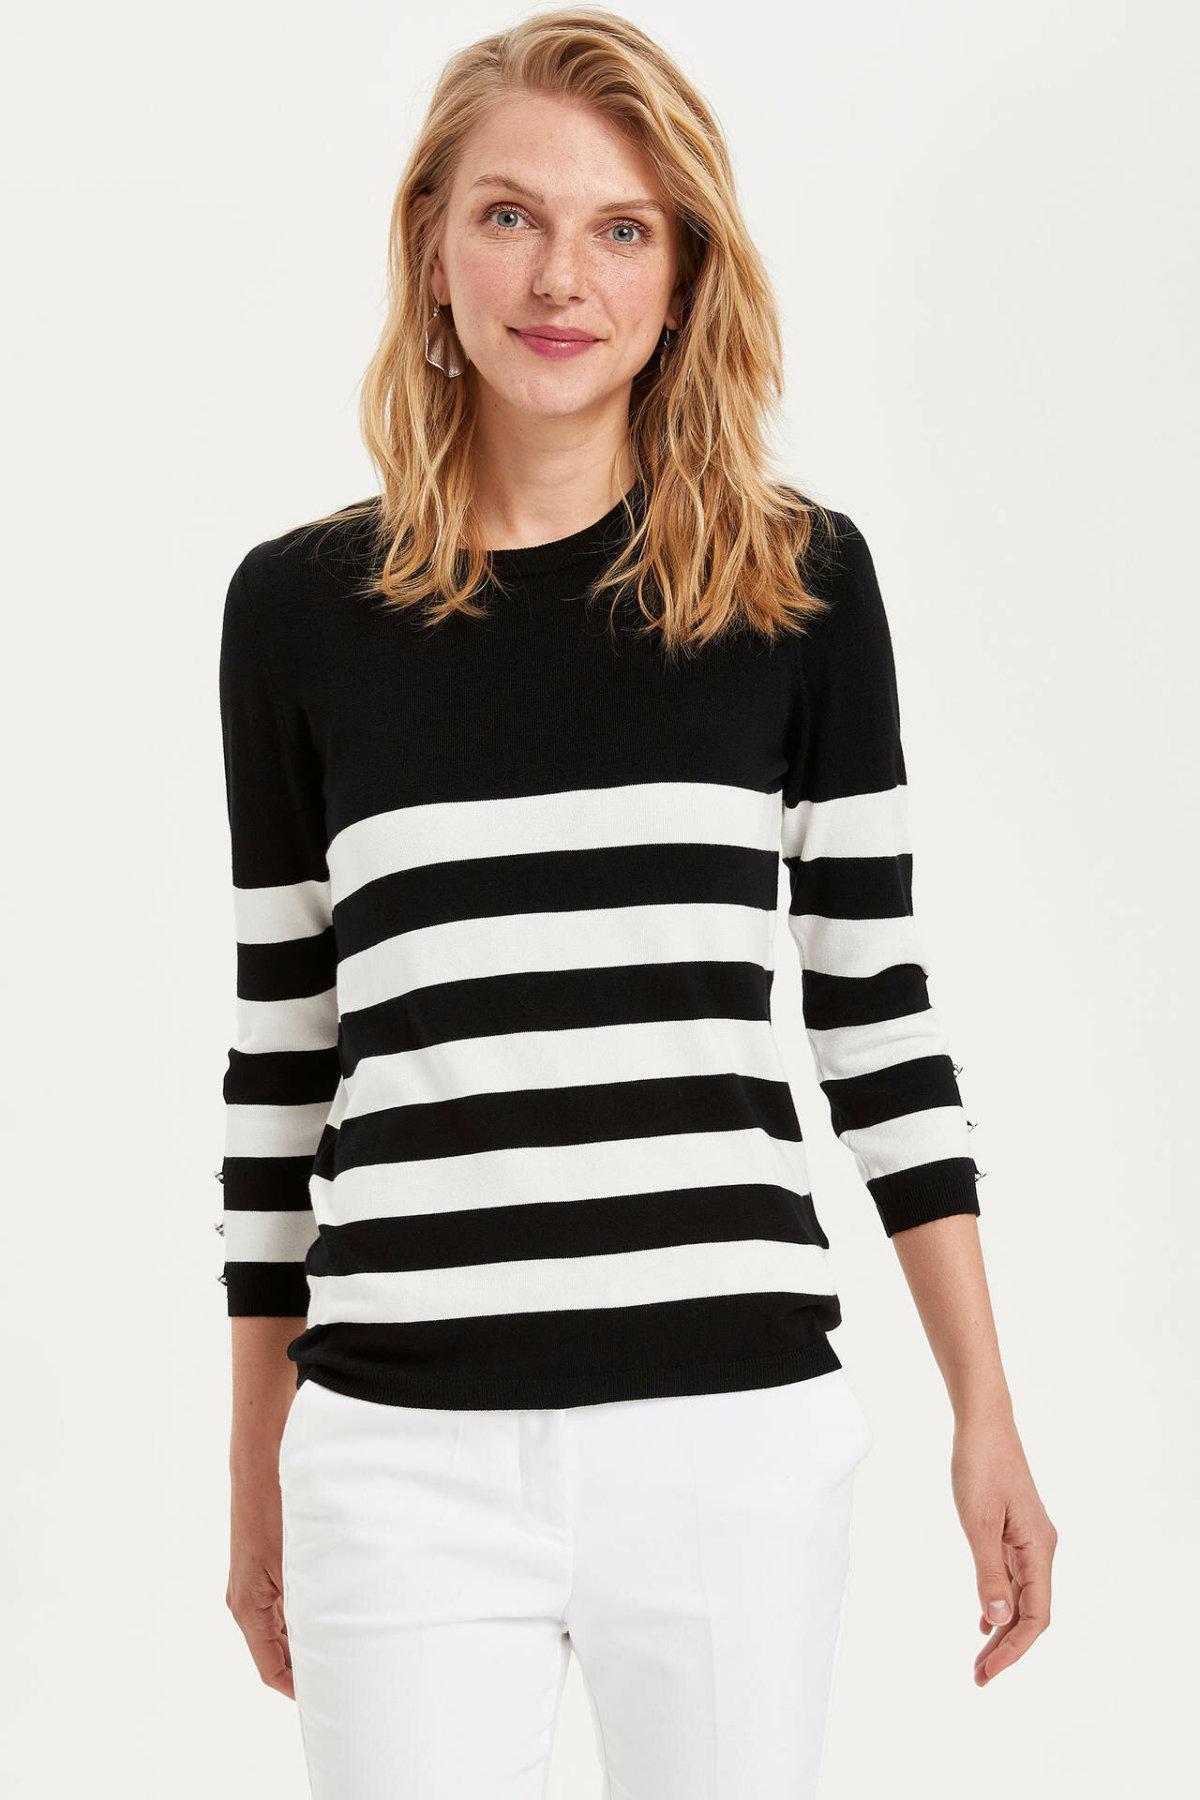 Moda de mujer de hecho negro blanco a rayas Pullover mujeres cuello redondo Casual de manga larga Camisetas para otoño Spring-K8007AZ19AU